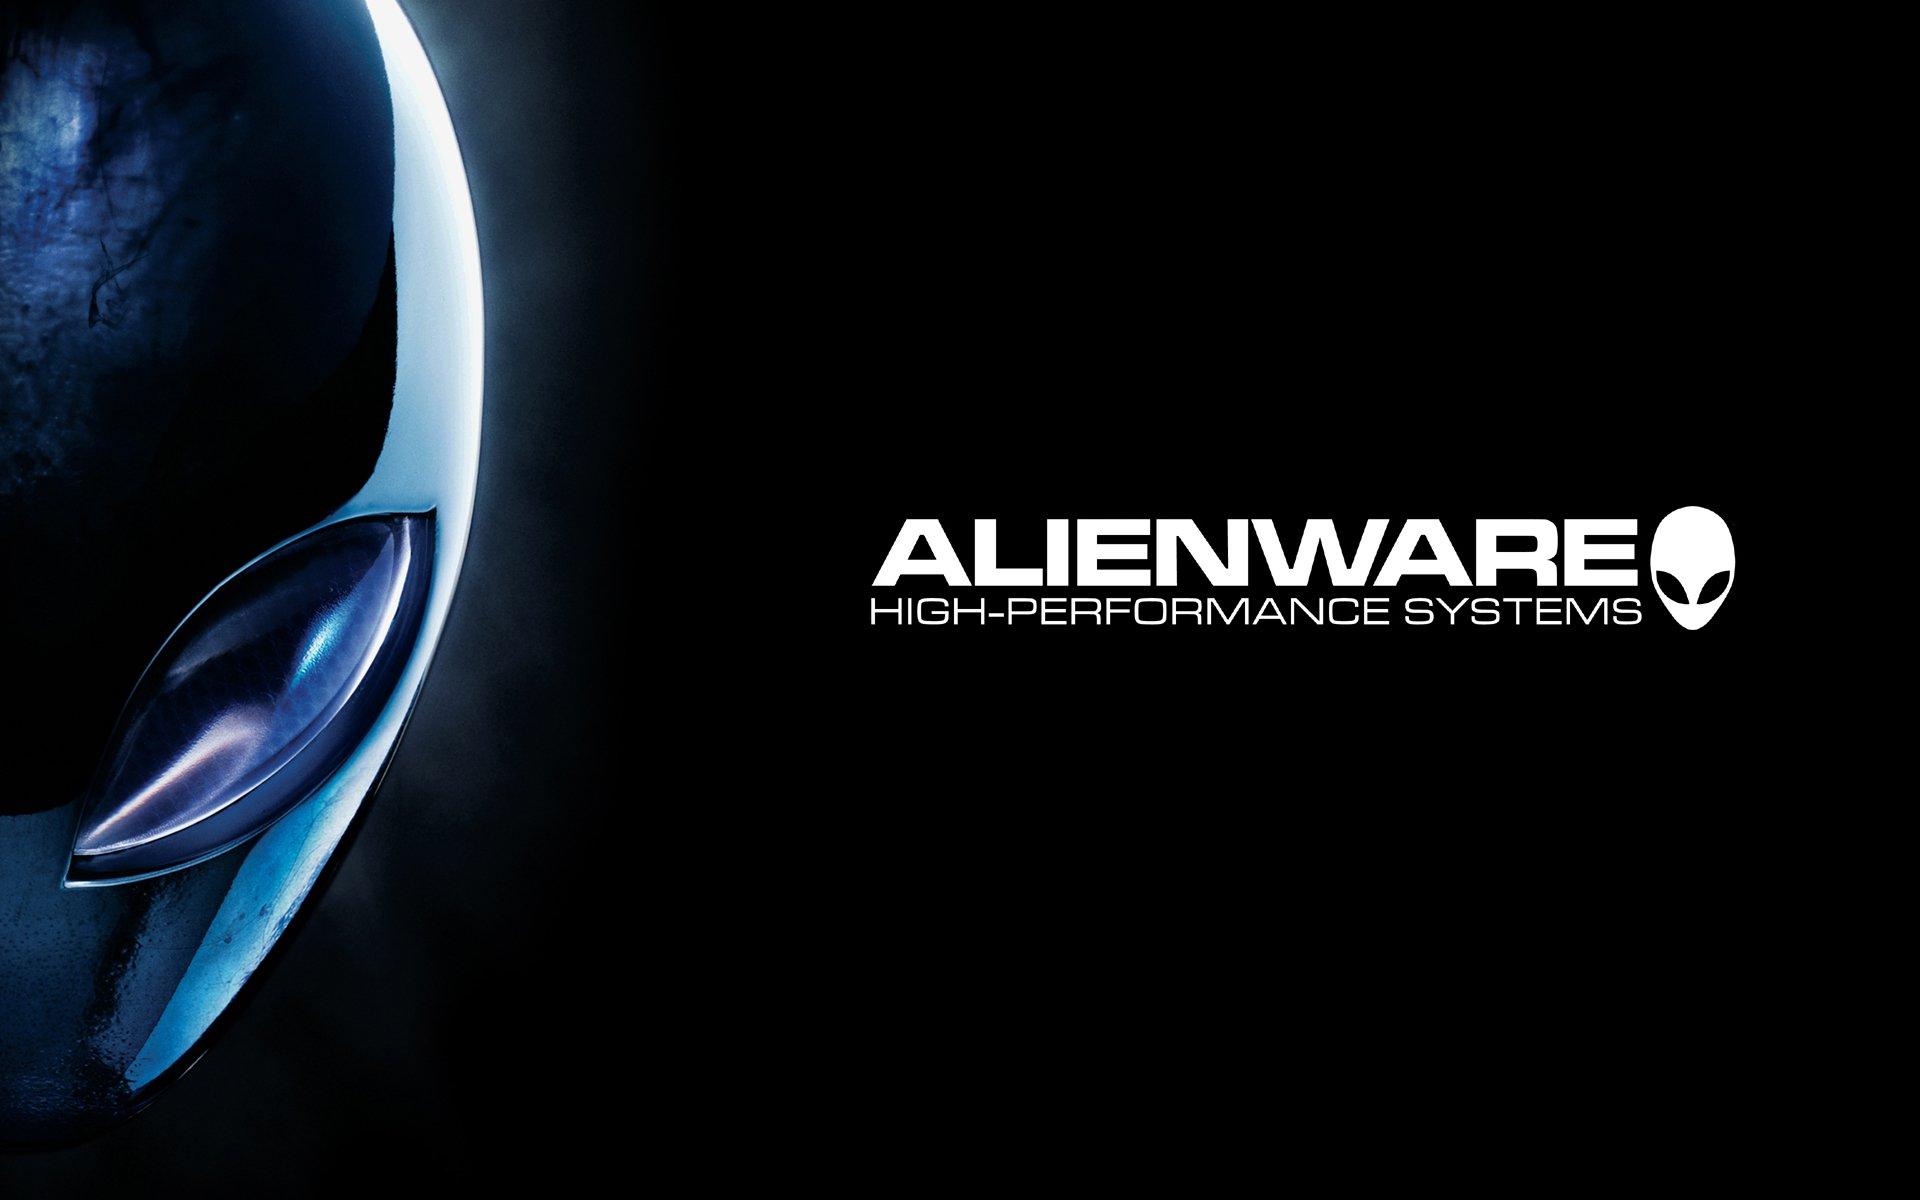 HD Alienware Wallpapers 19201080 Alienware Backgrounds for Laptops 1920x1200